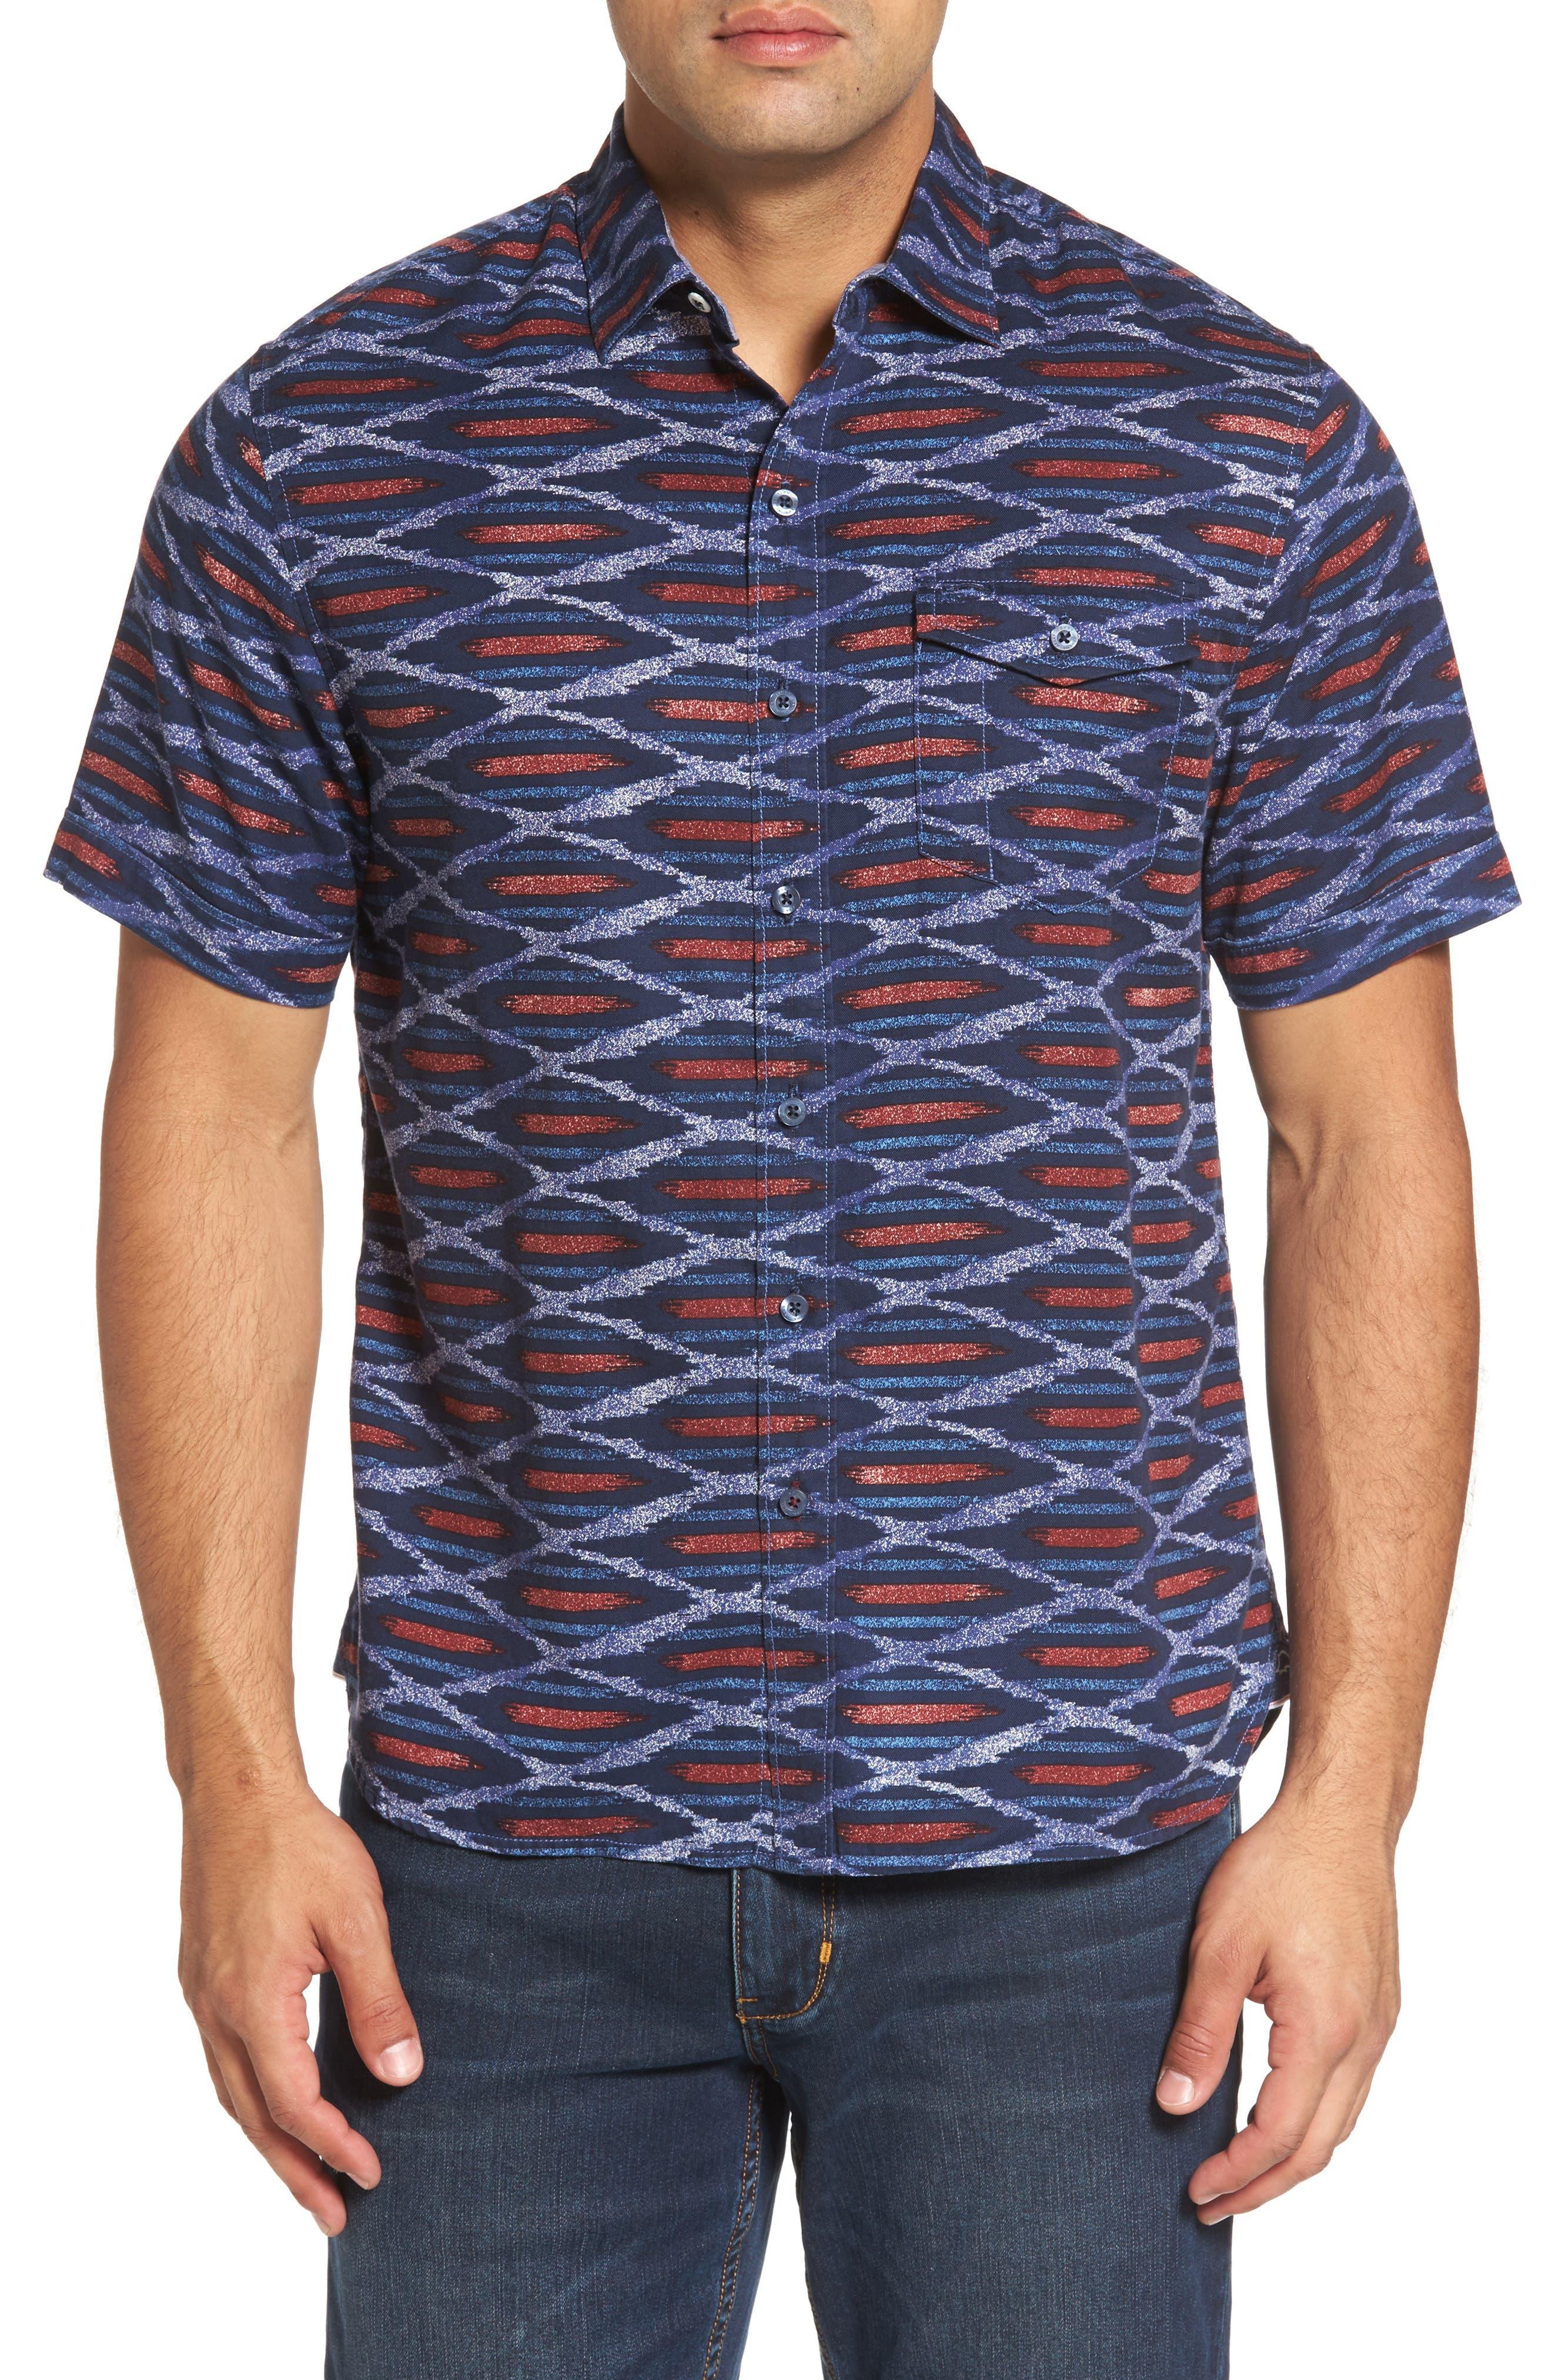 Alternate Image 1 Selected - Tommy Bahama Island Ikat Standard Fit Geo Print Woven Shirt